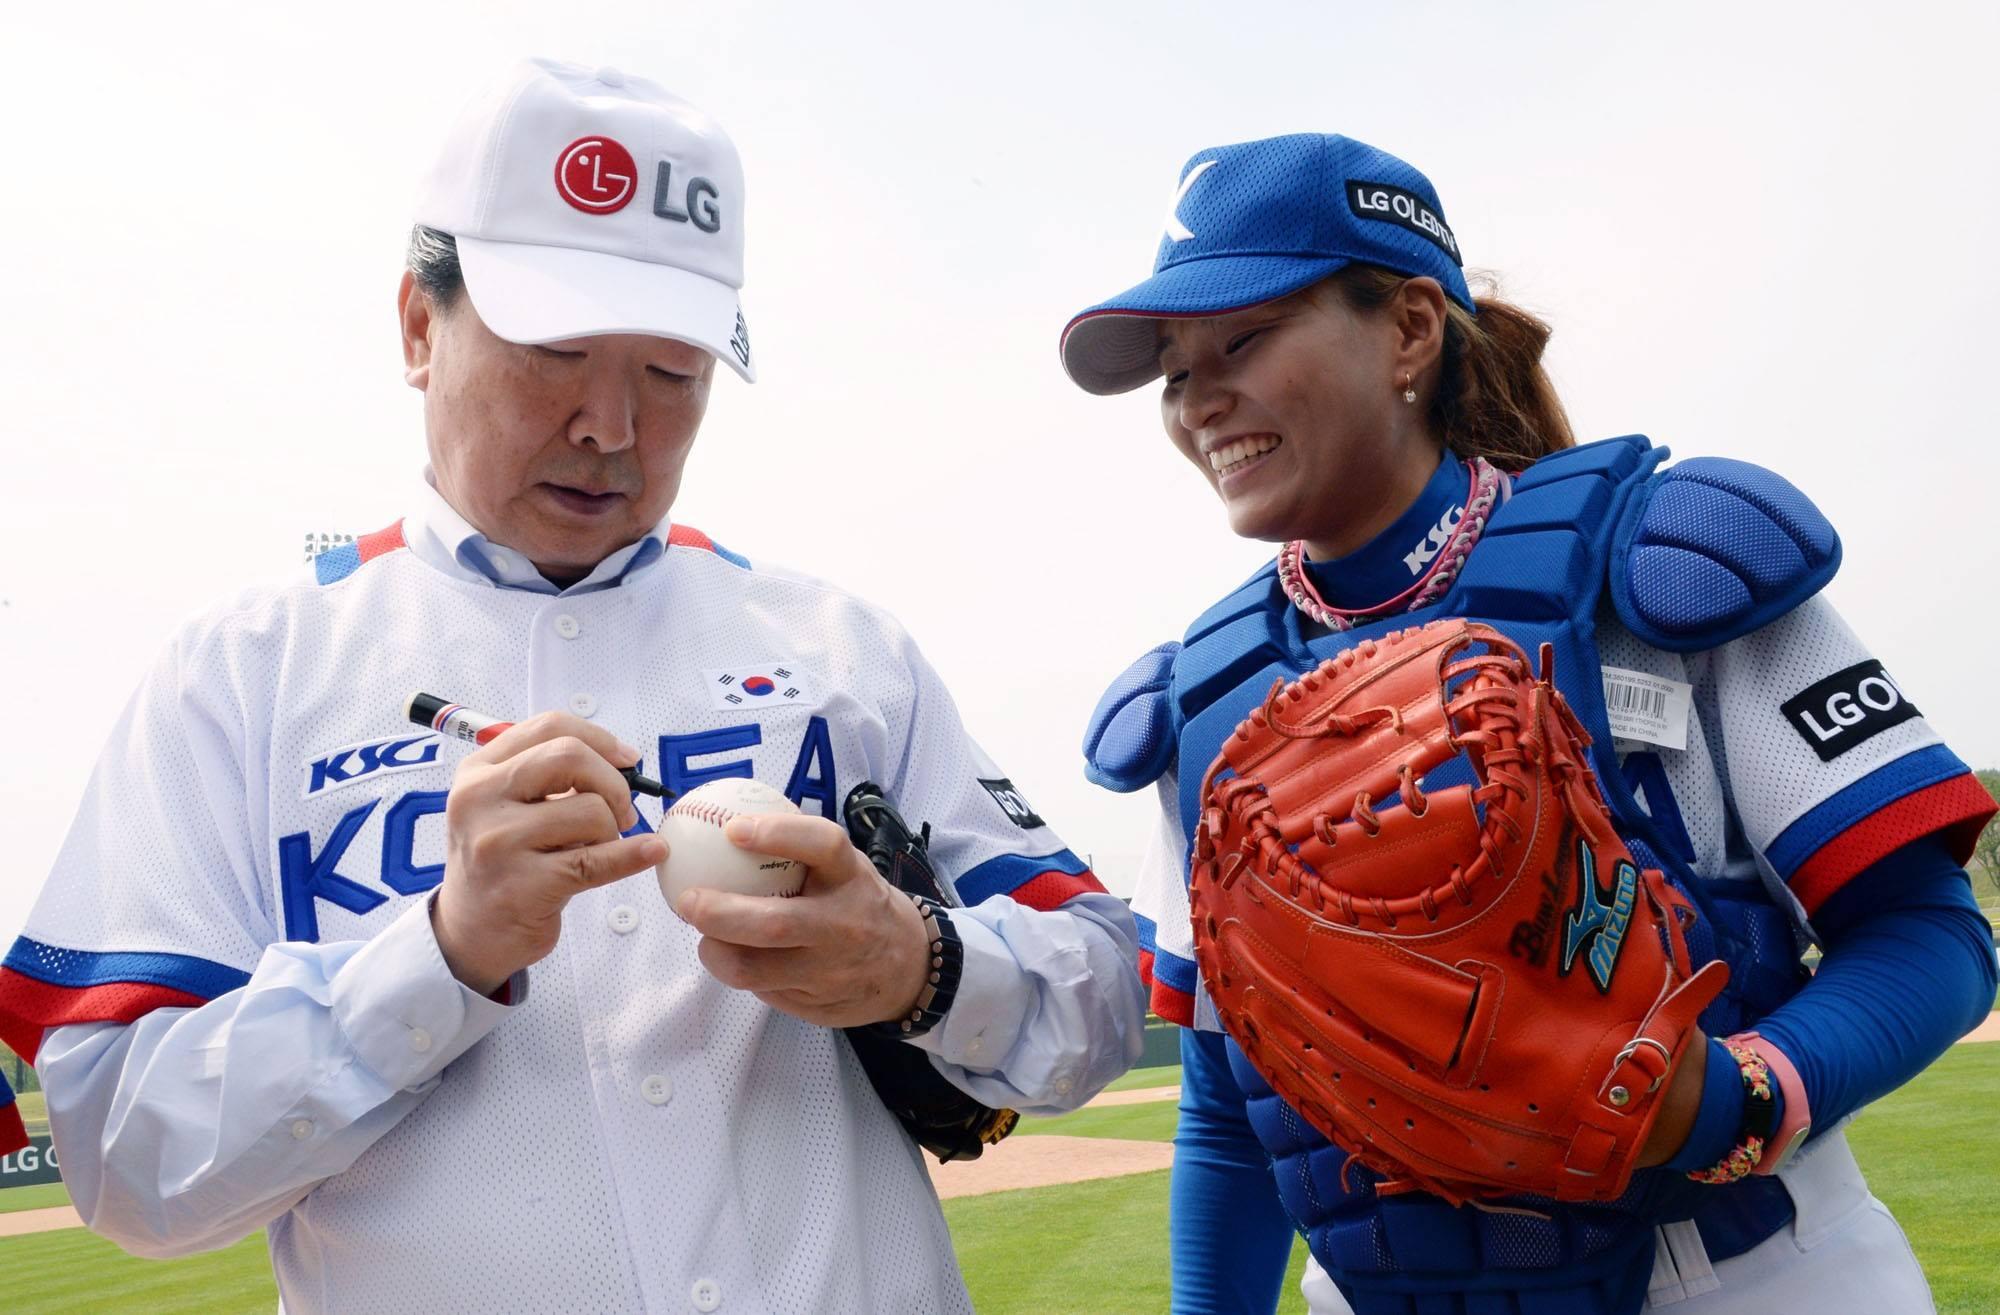 WBSC announces LG as Title Sponsor of Women's Baseball World Cup